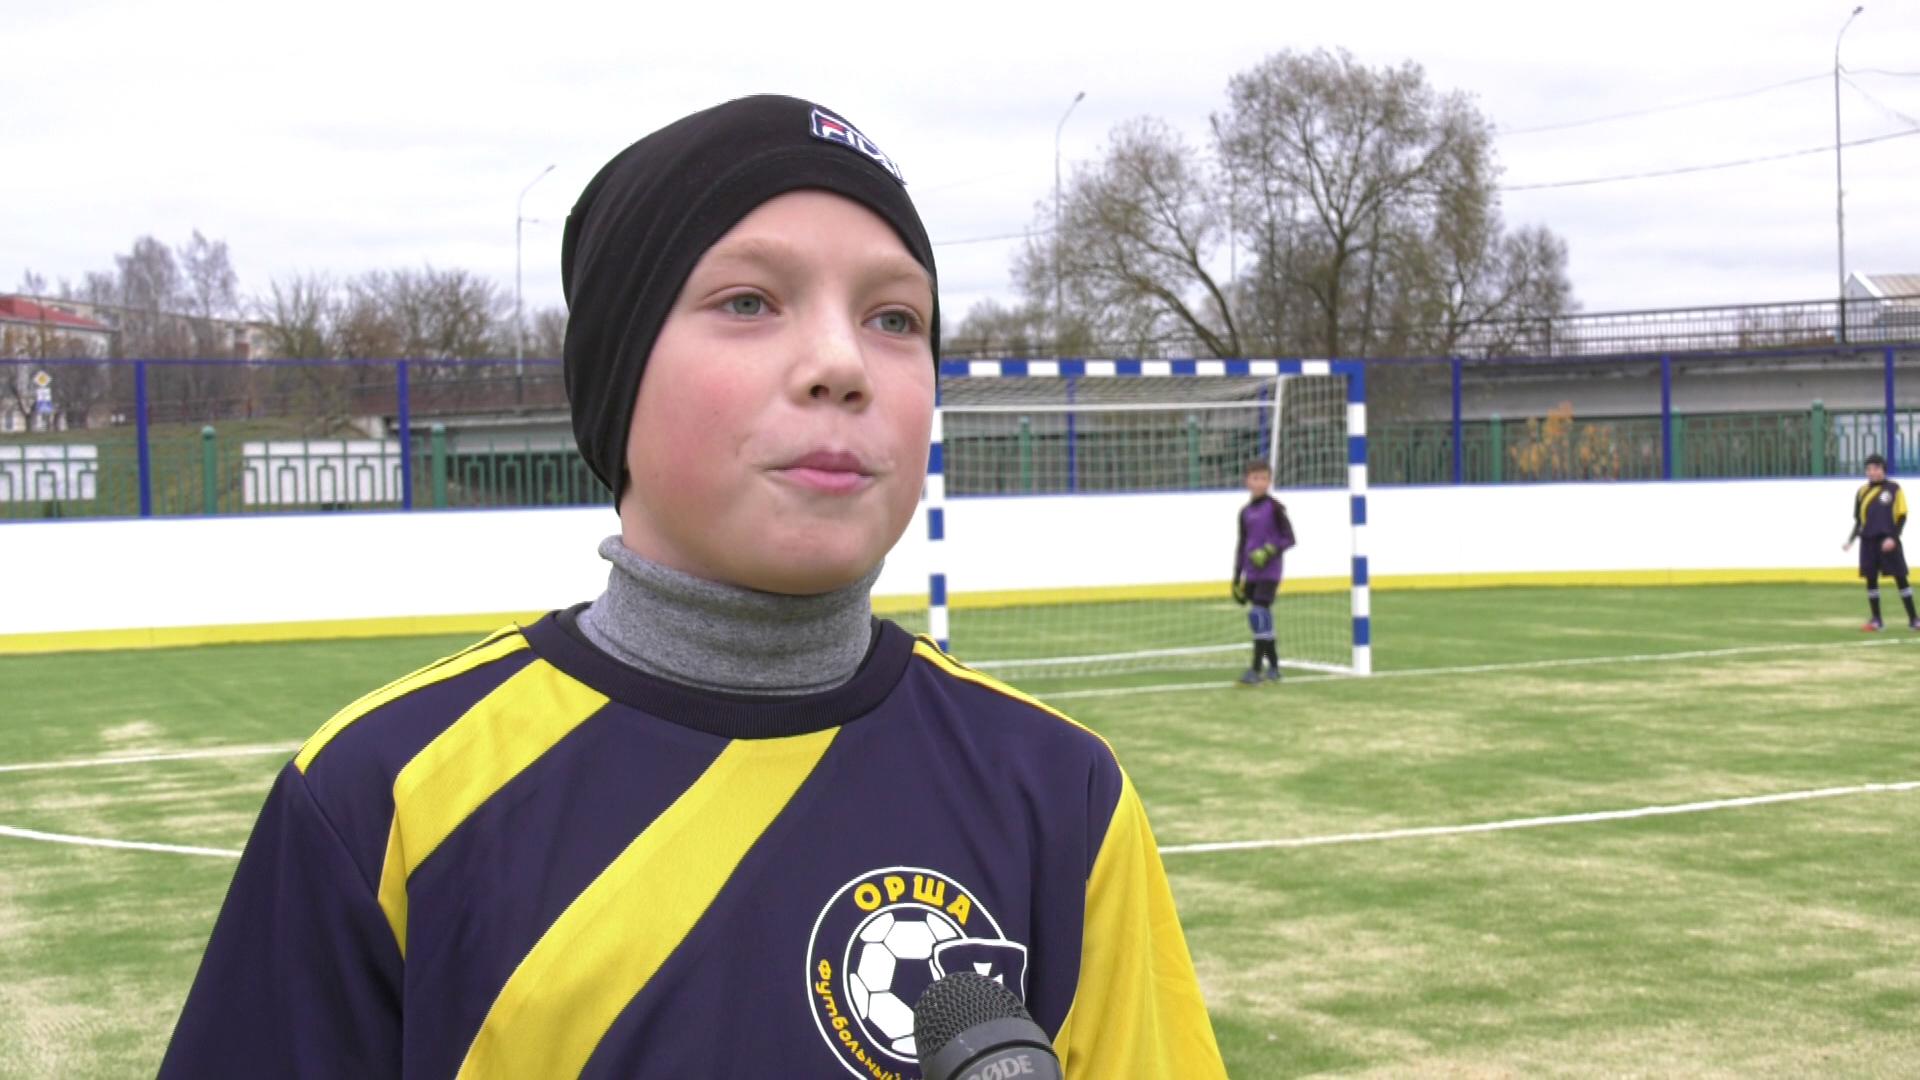 stadion v orshe - Обновлённый спорткомплекс «Олимпиец» открыли в Барани (видео)